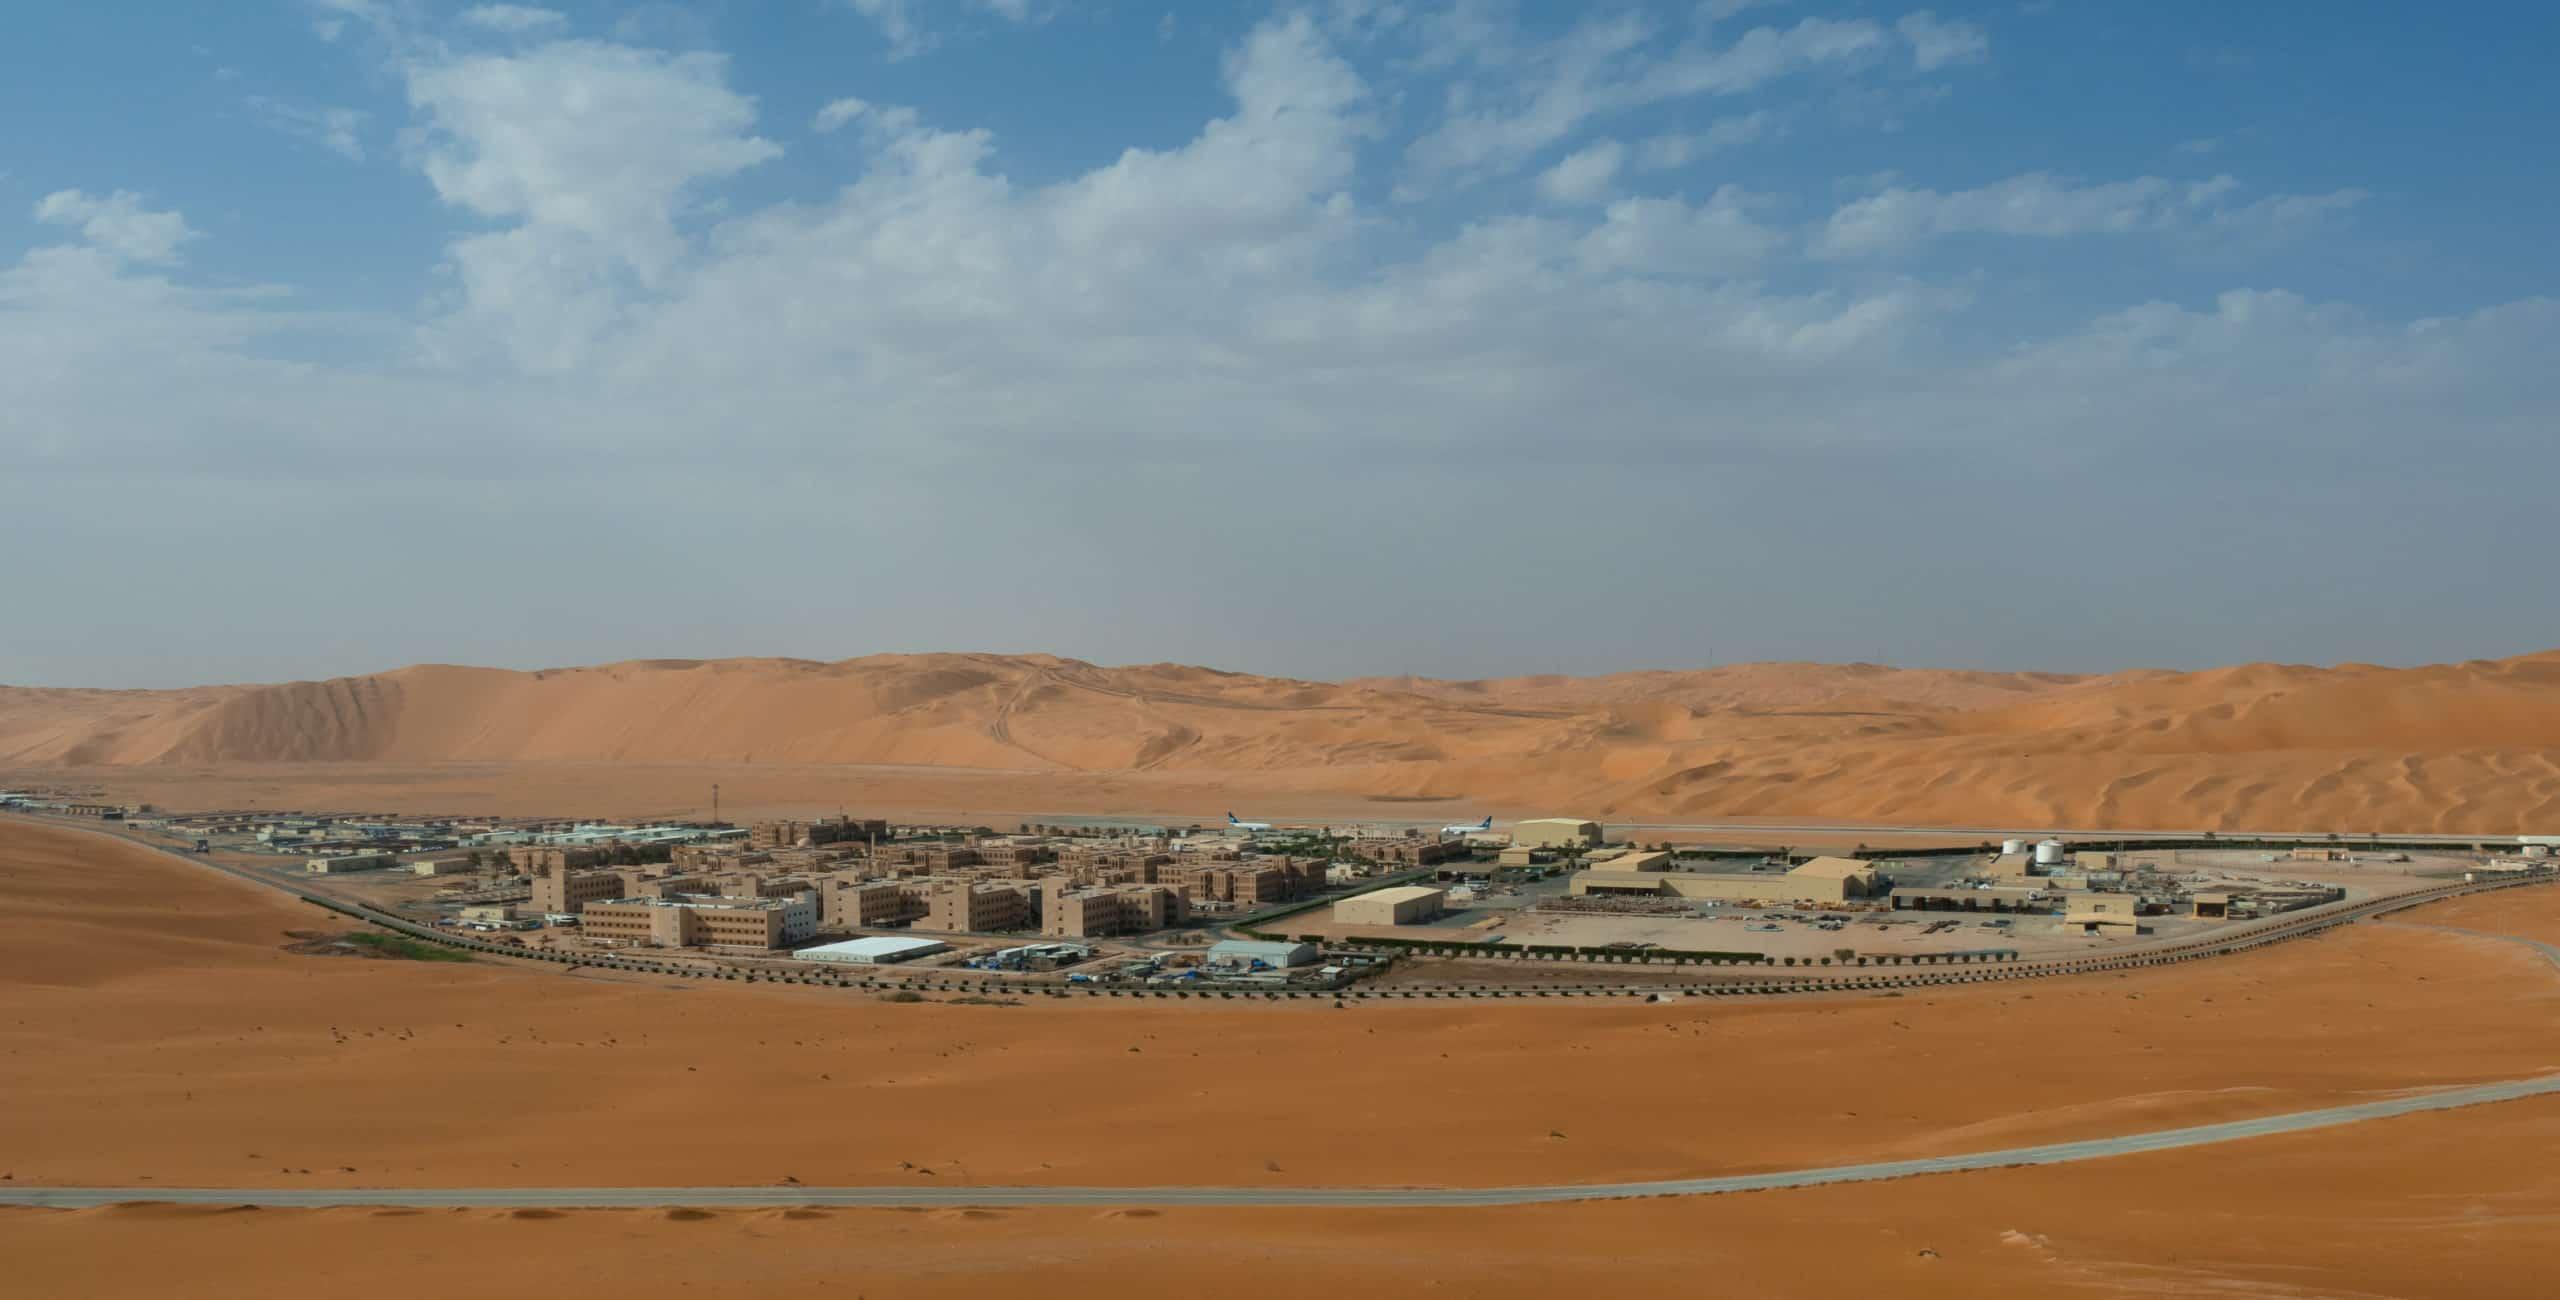 Shaybah Oil Field - Saud Aramco